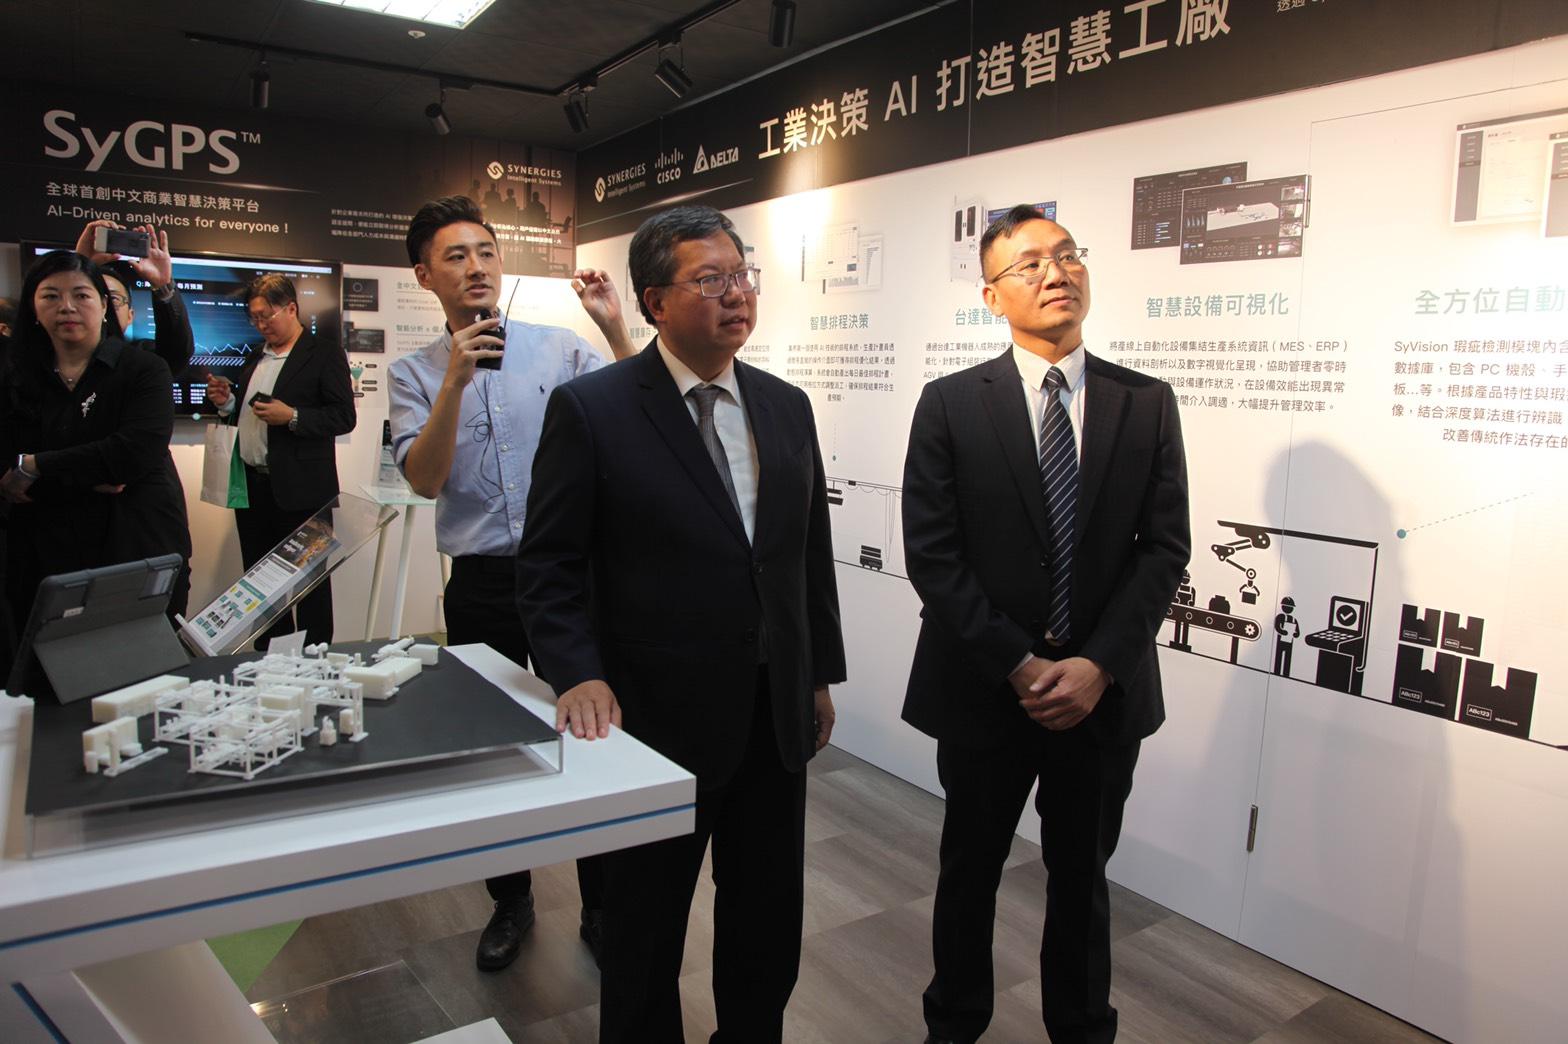 AIoT新時代!桃園航空城、台灣思科智慧創新示範中心正式啟用